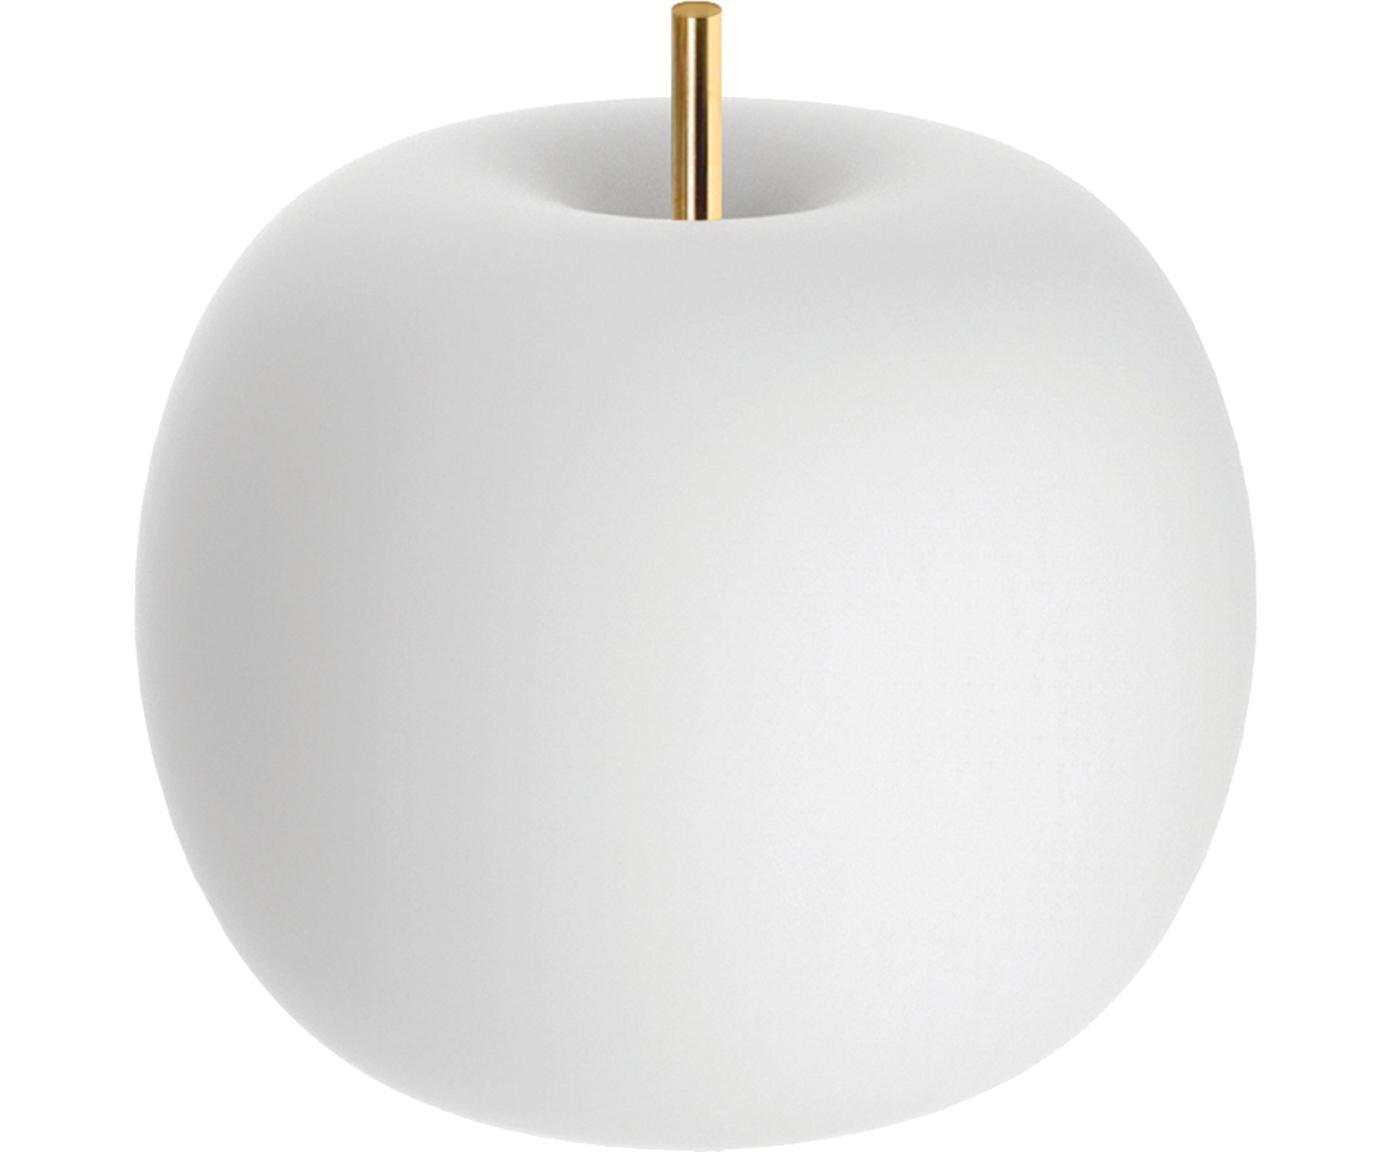 LED tafellamp Kushi, Geëtst glas, gepoedercoat messing, Wit, messingkleurig, Ø 16 x H 16 cm